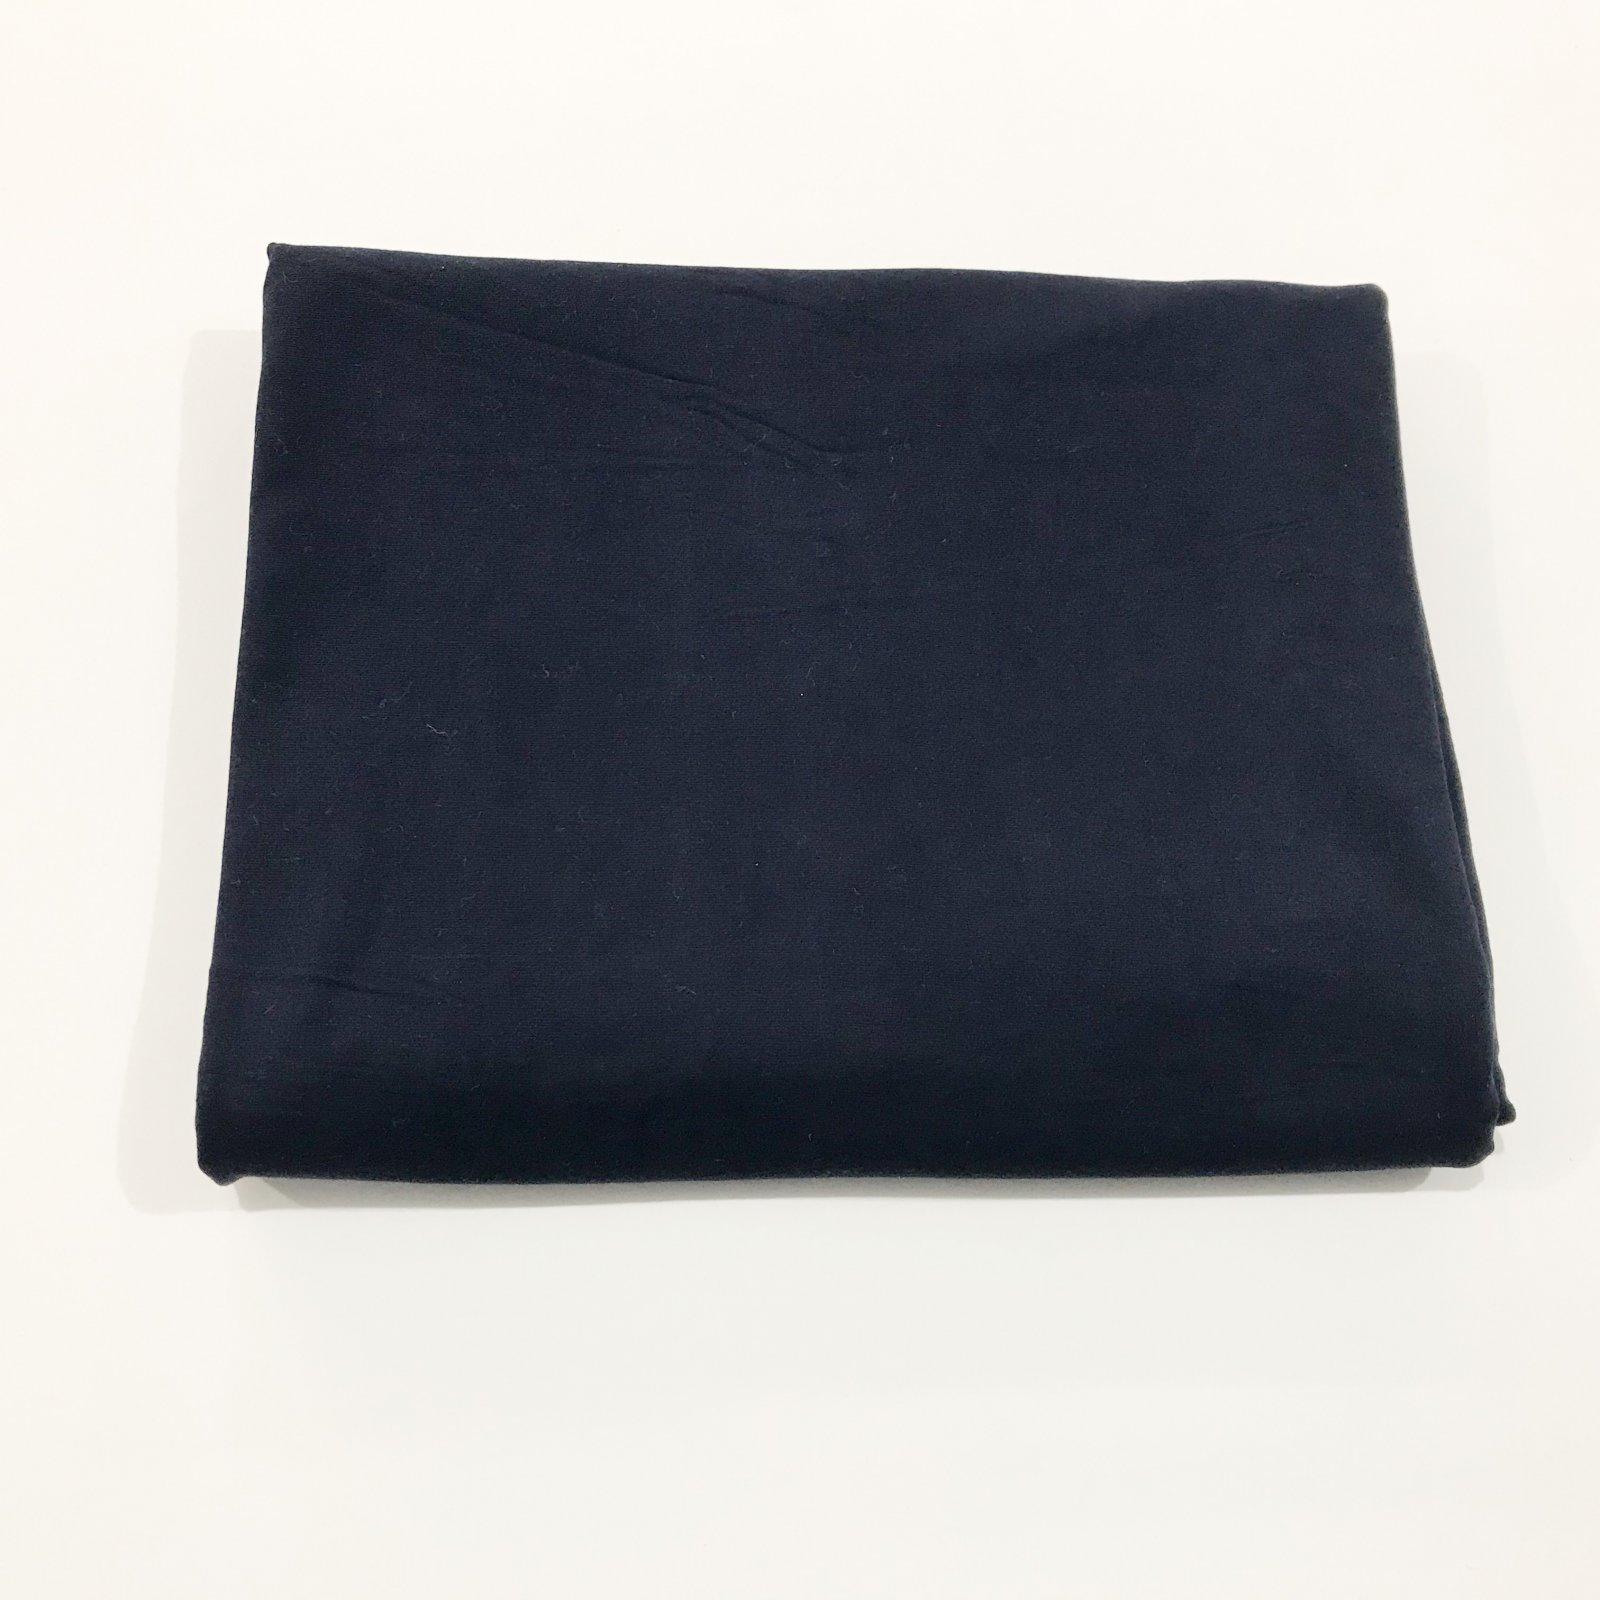 1 yard + 6 inches - Modal Knit in Stargazer